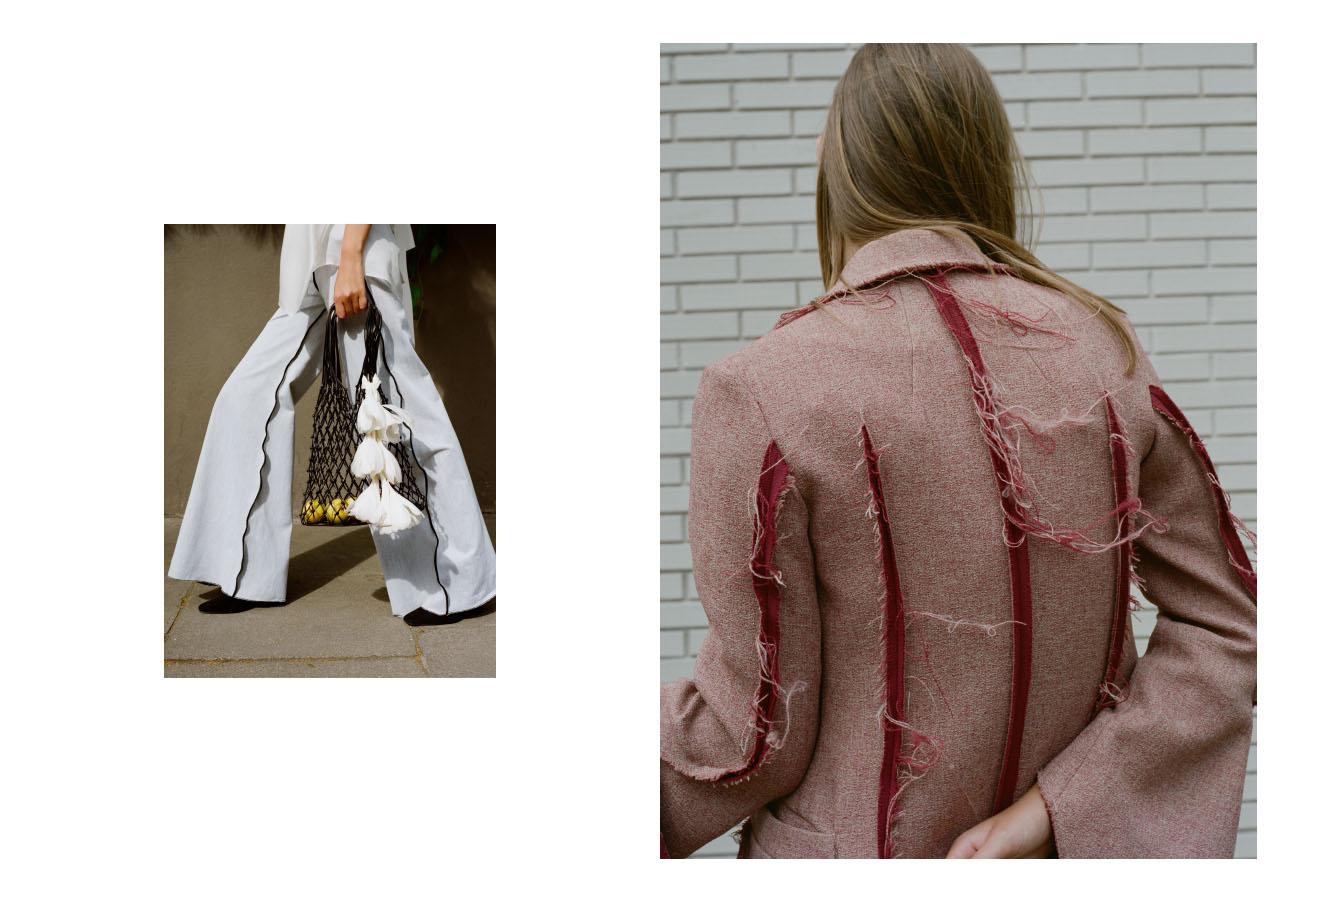 top   EMMA DAVYS   pants   PEET DULLAERT   shoes and bag   CELINE  . coat   JH ZANE